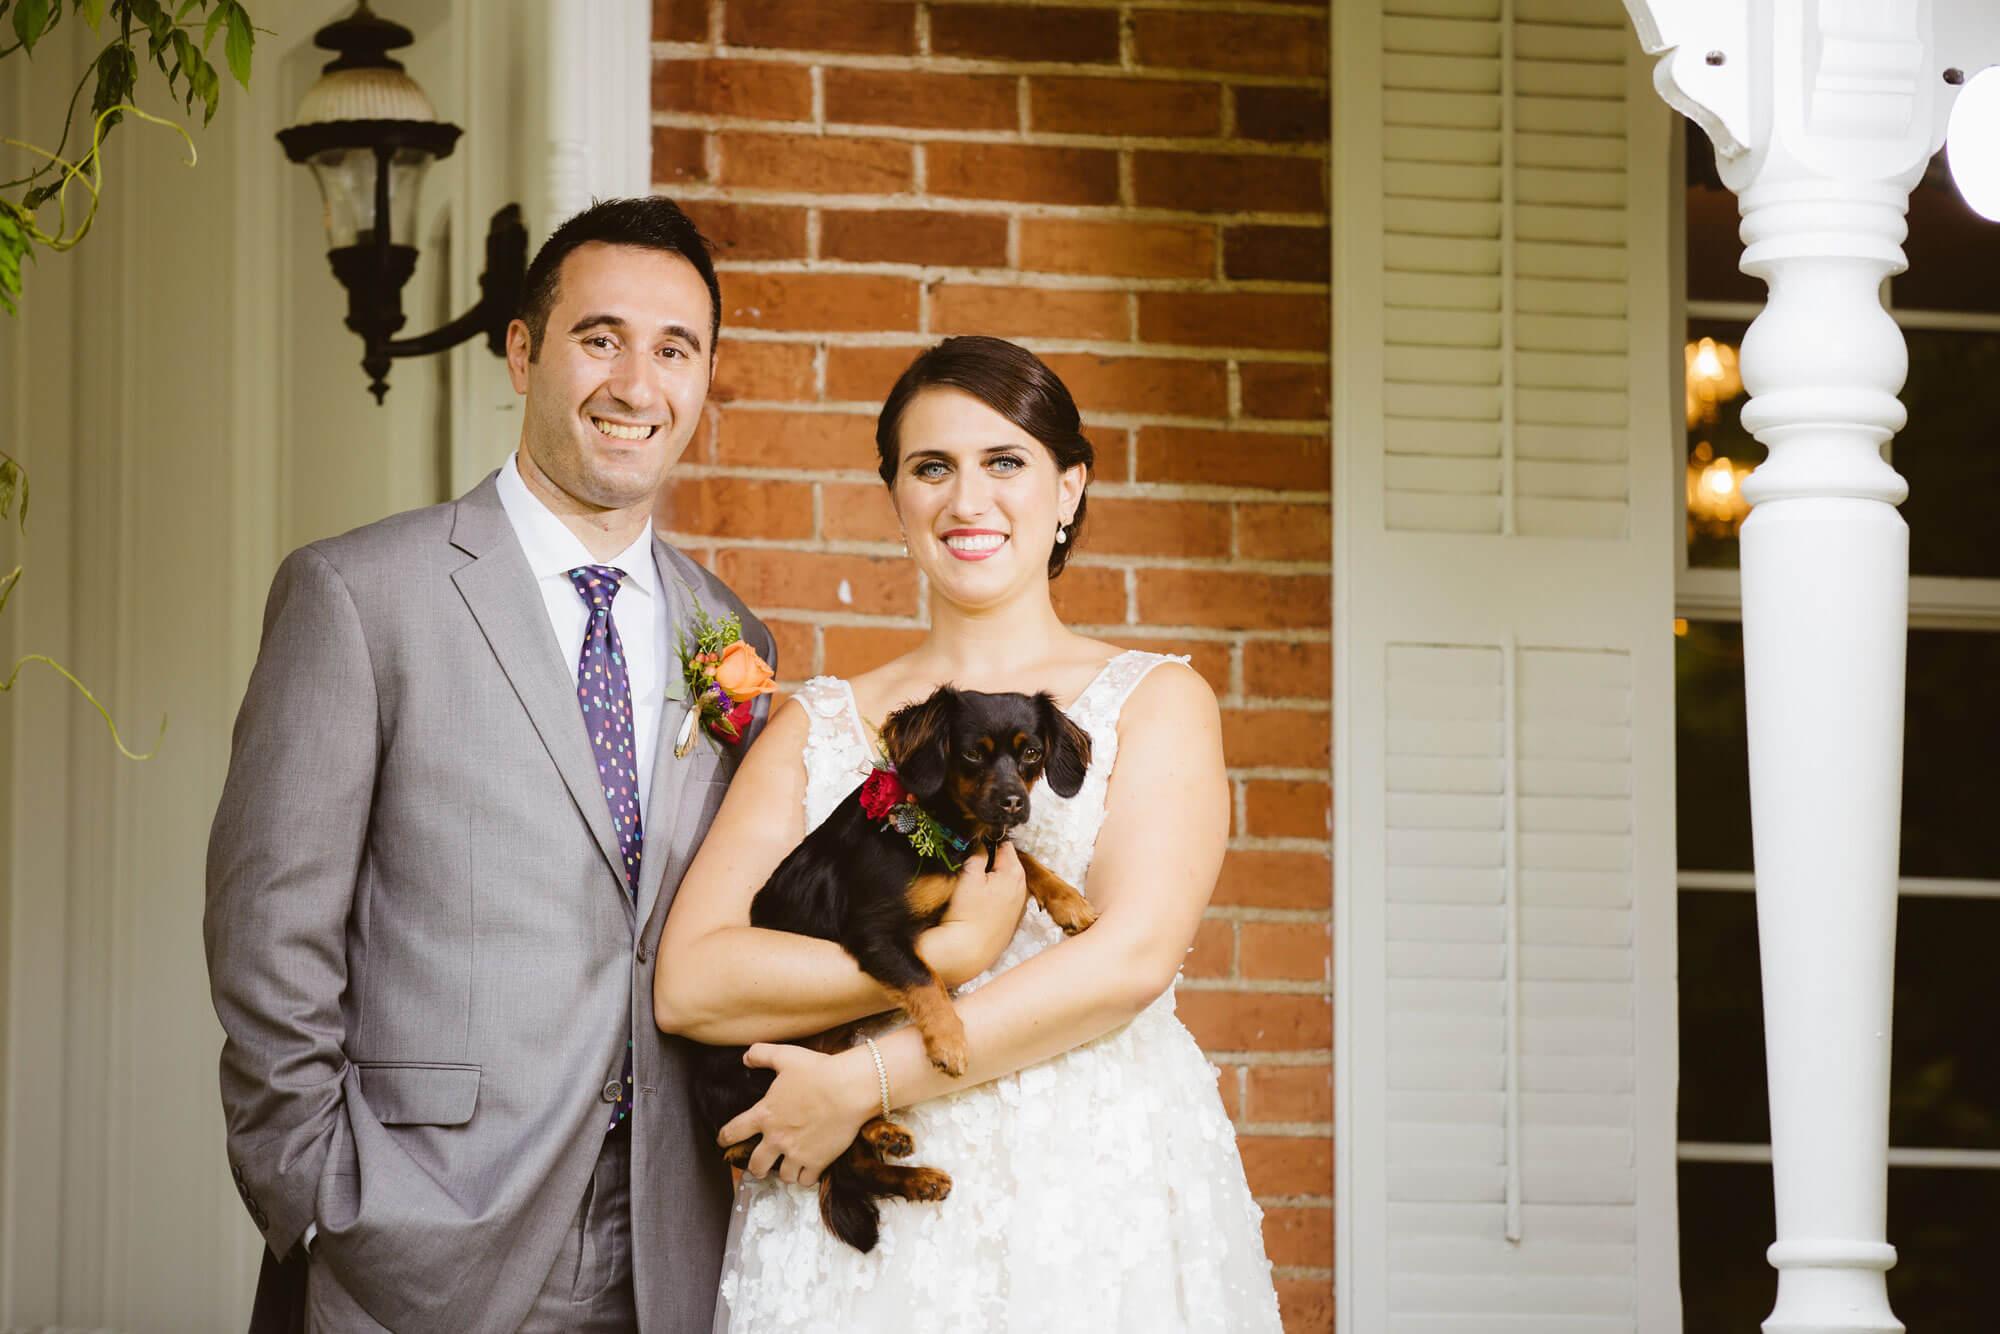 Erica-Kay-Photography---Kate-_-Joe-Wedding-26.jpg